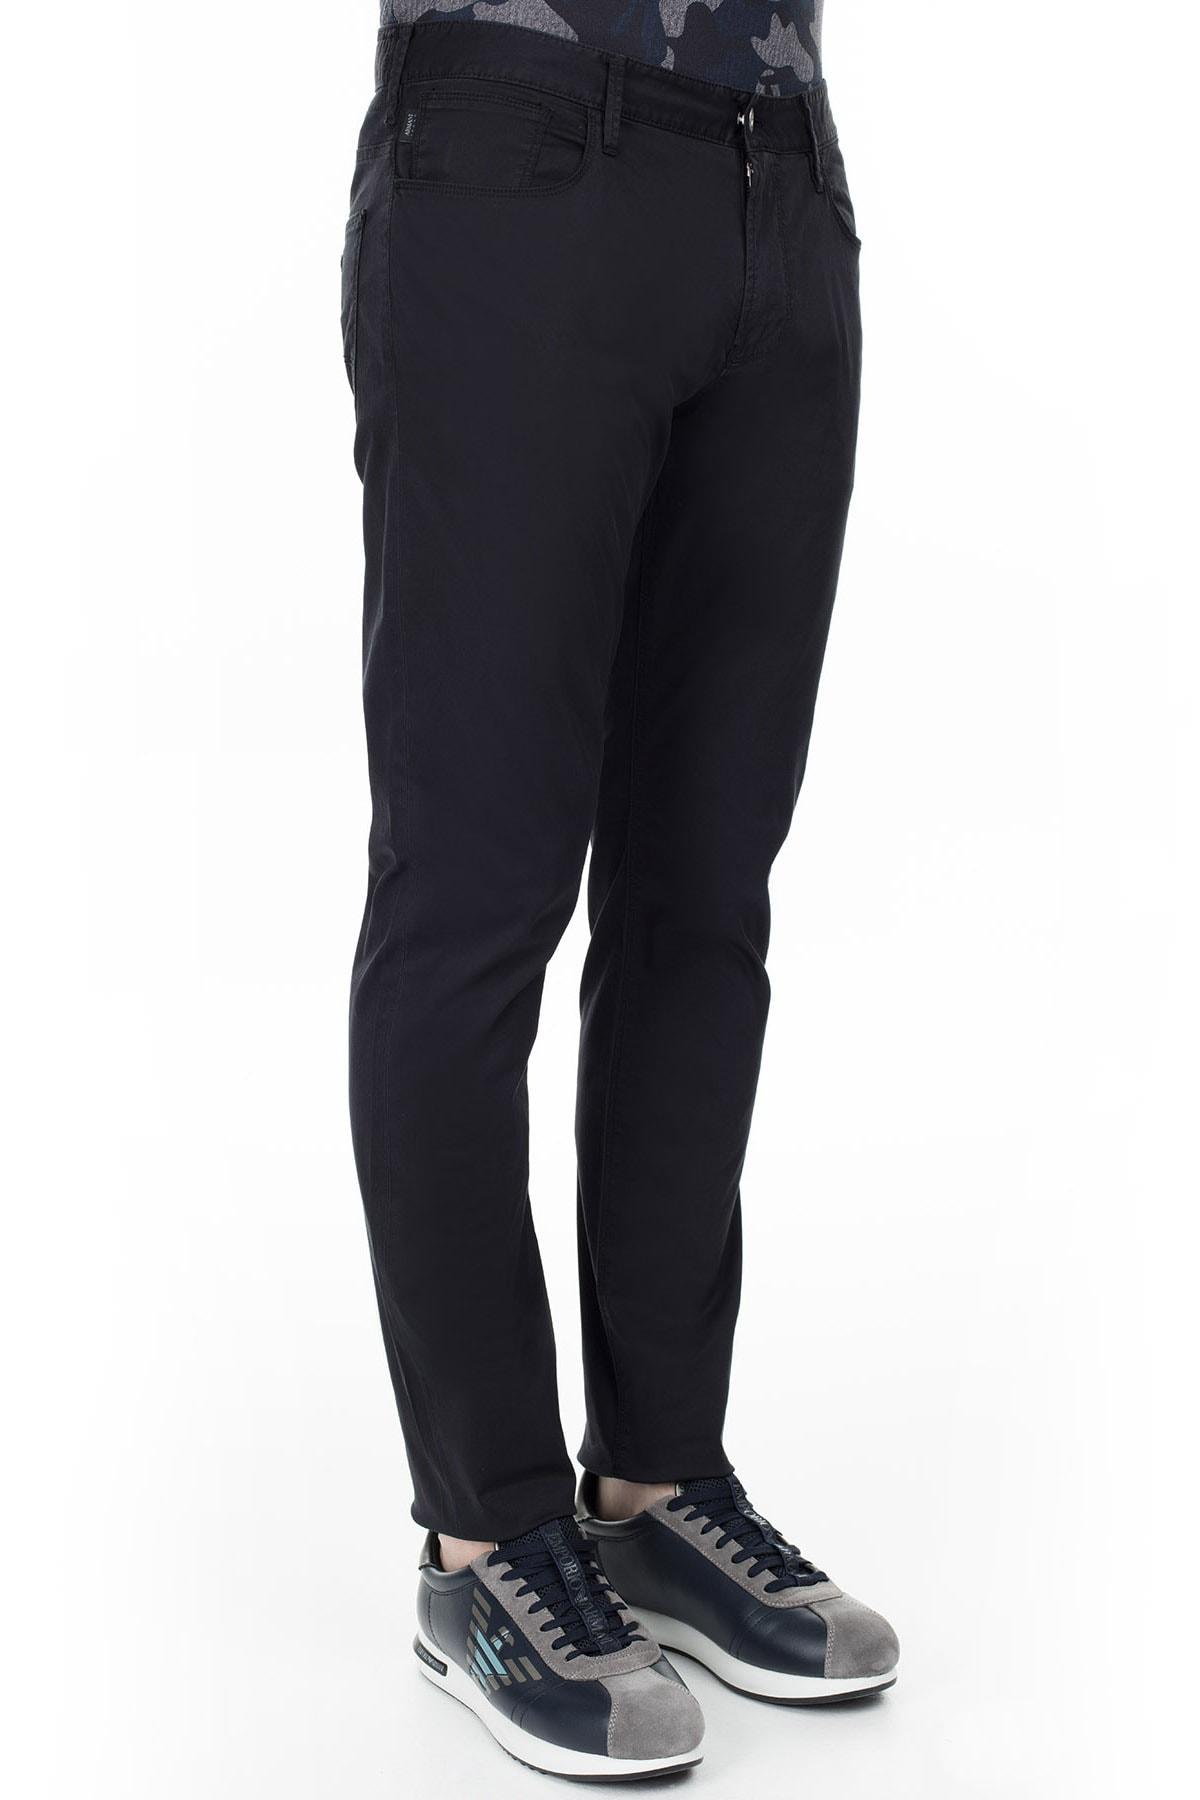 Armani Jeans Armani J06 Jeans Erkek Pamuklu Pantolon 3Y6J06 6Nedz 0561 2